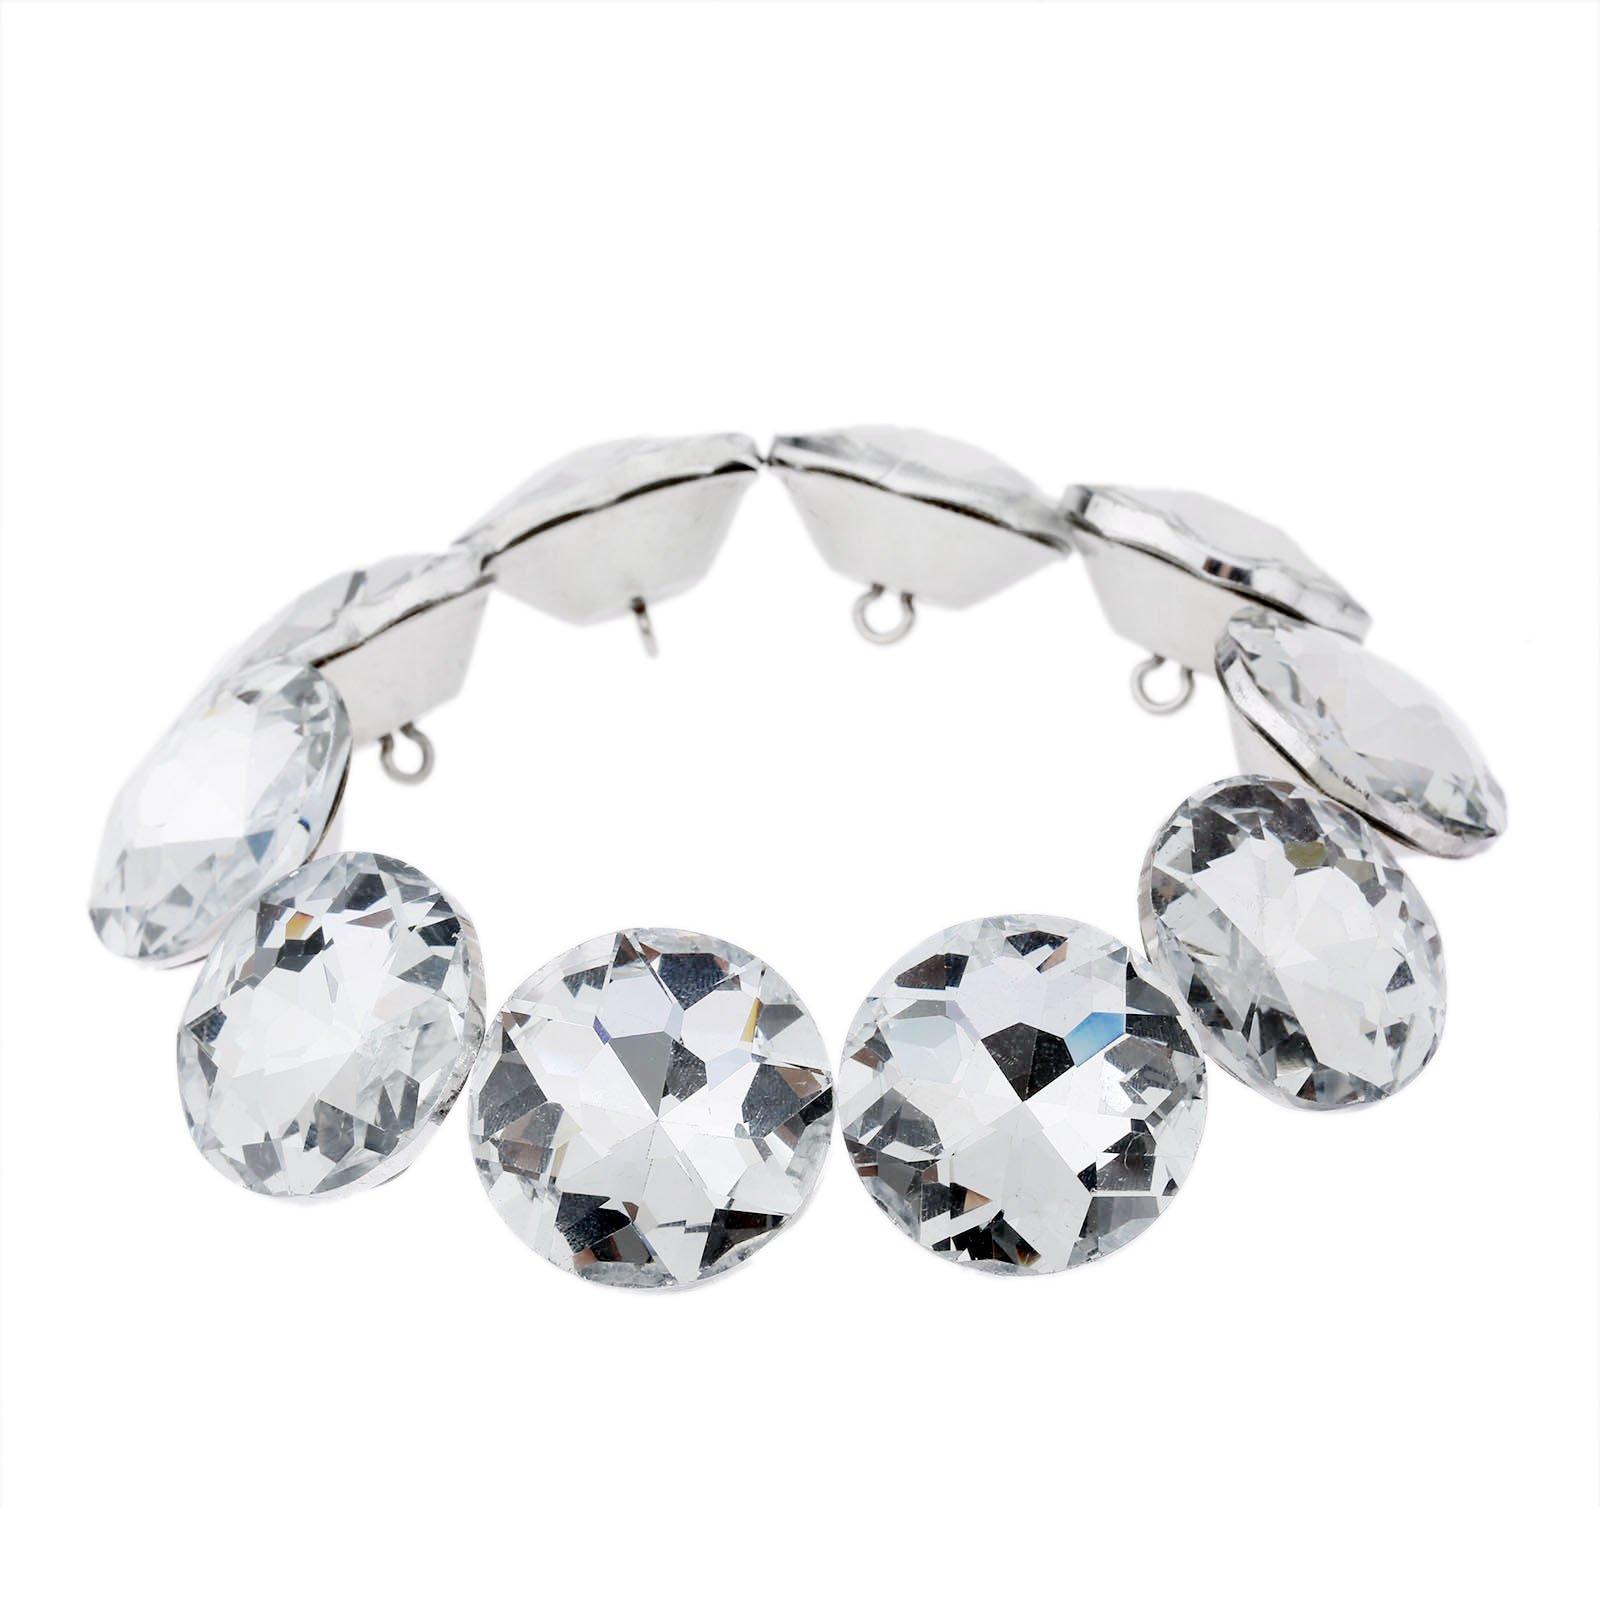 20pcs Diamond Crystal Upholstery Sofa Headboard Sew Buttons Wall Decor 30mm Dia